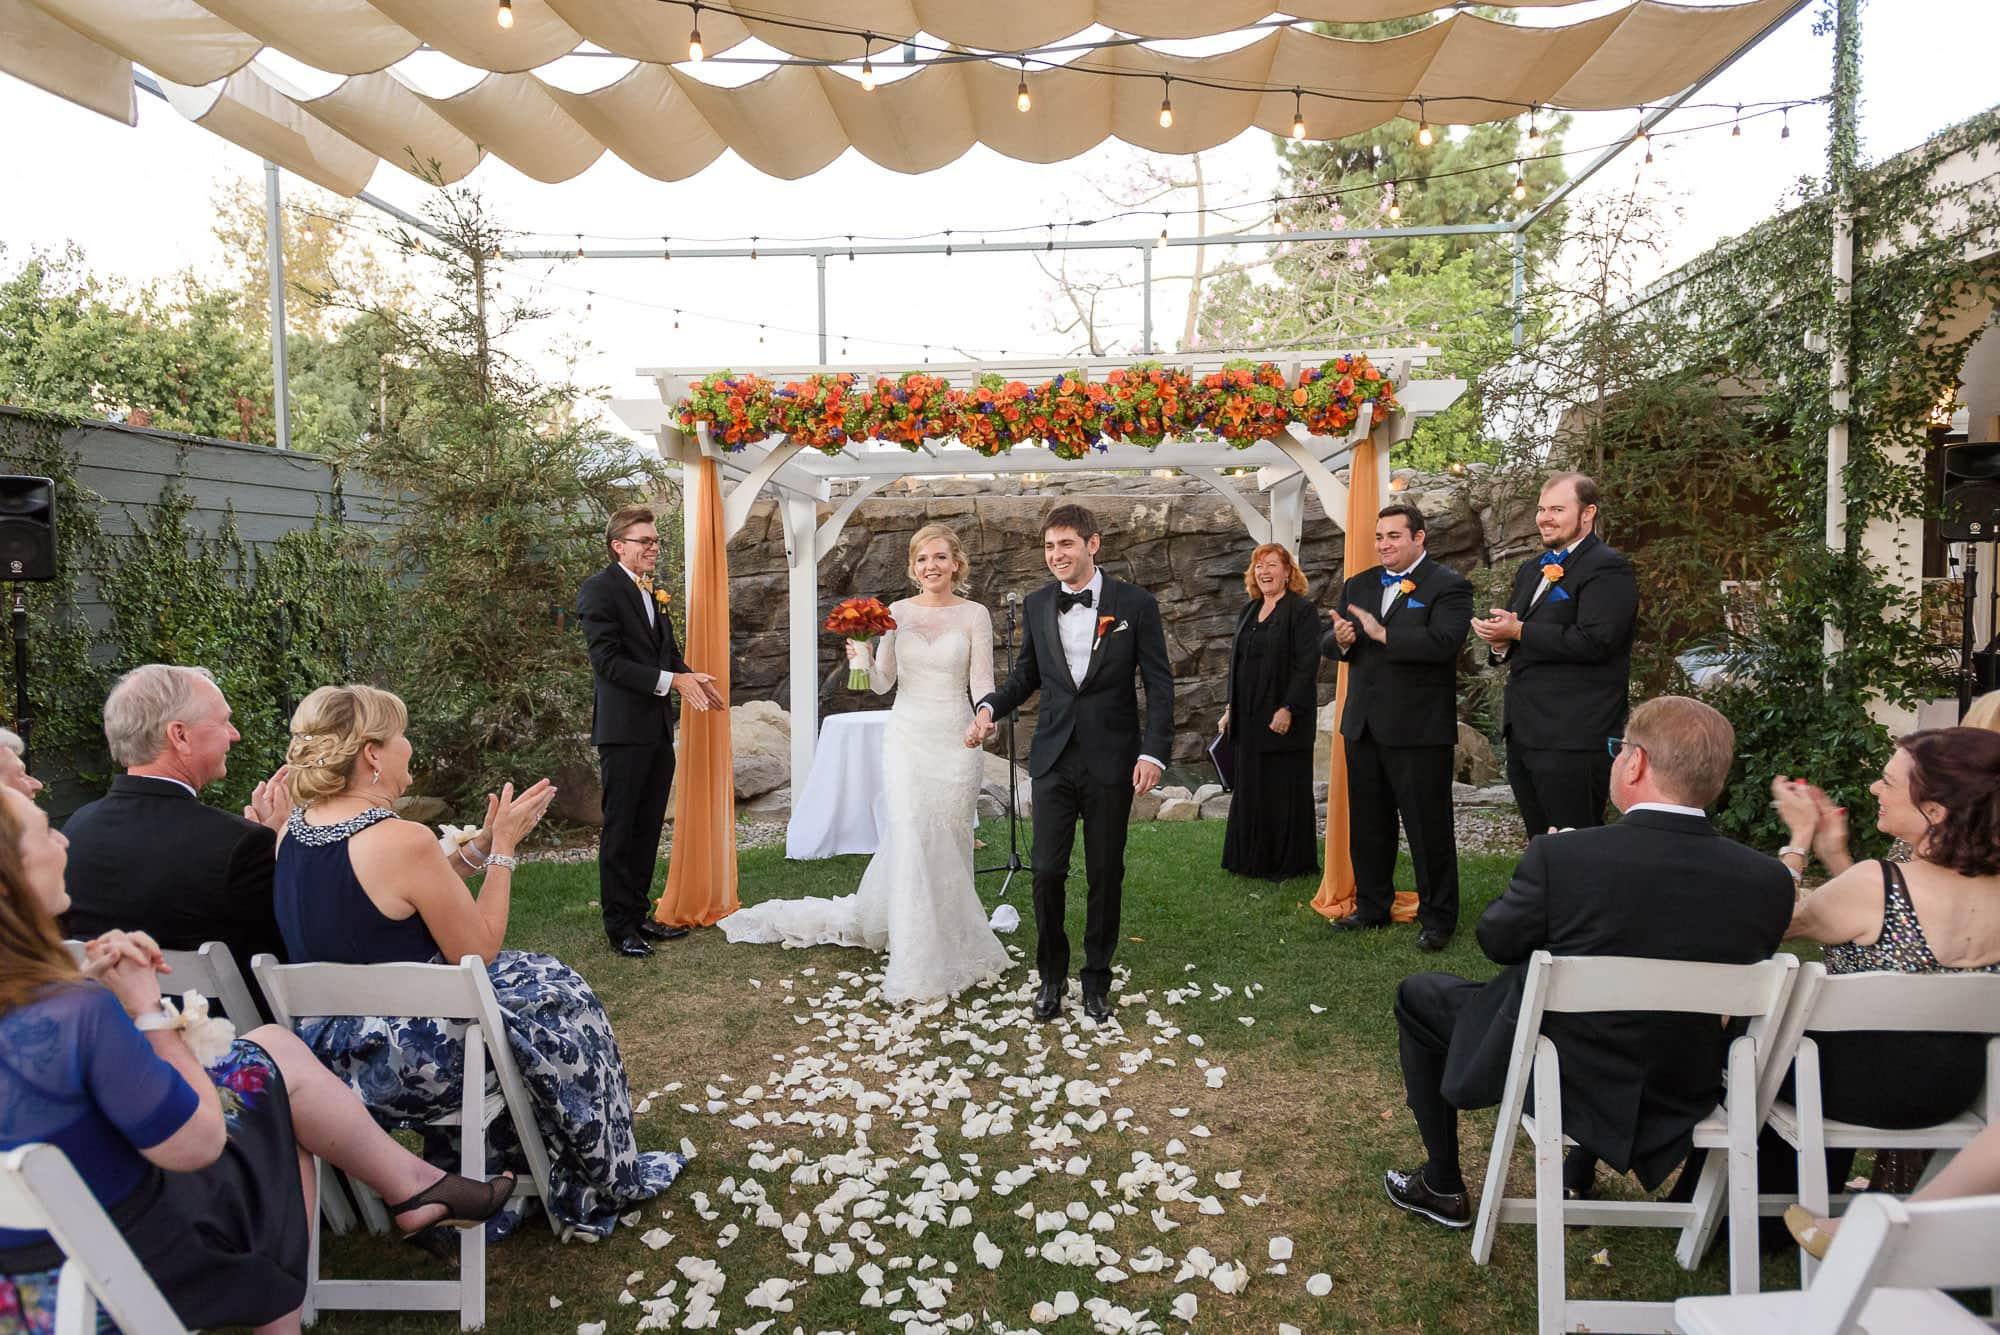 059_Alan_and_Heidi_Los_Angeles_Equestrian_Center_Wedding